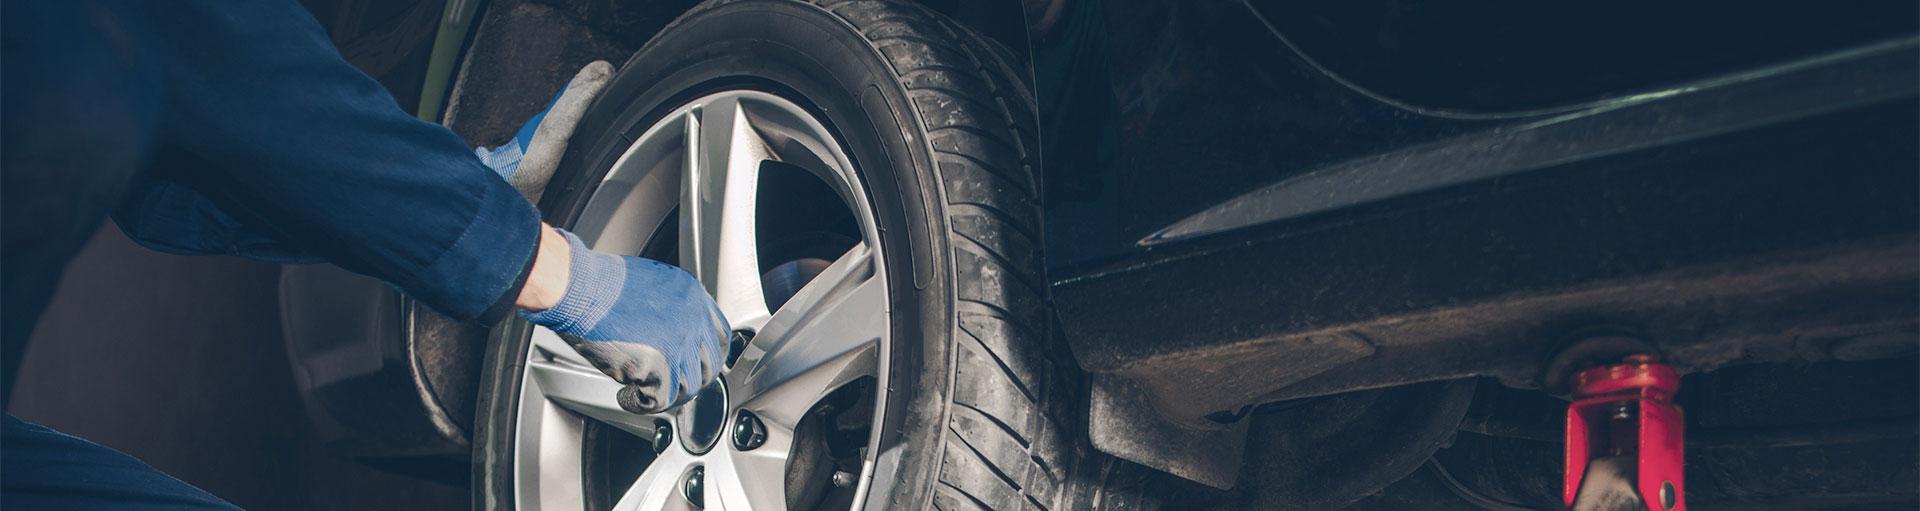 Russ Darrow Mitsubishi Tire Department